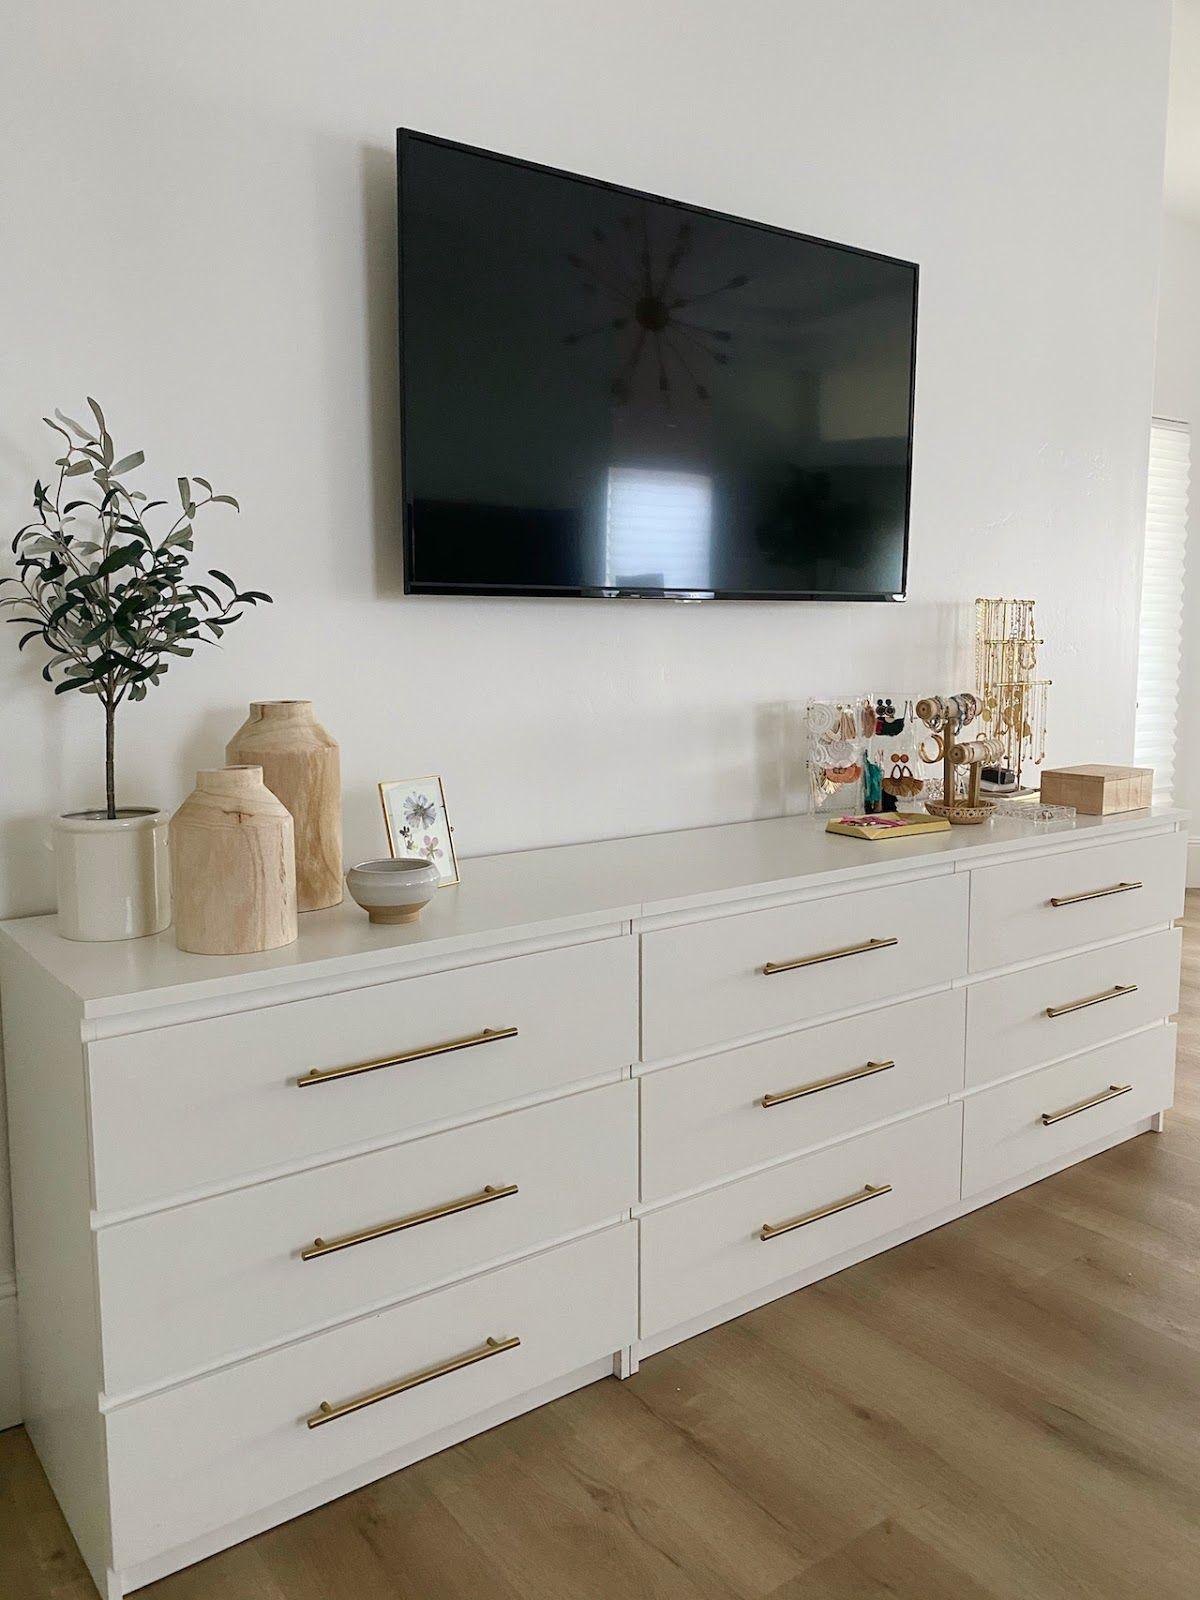 DIY IKEA Dresser